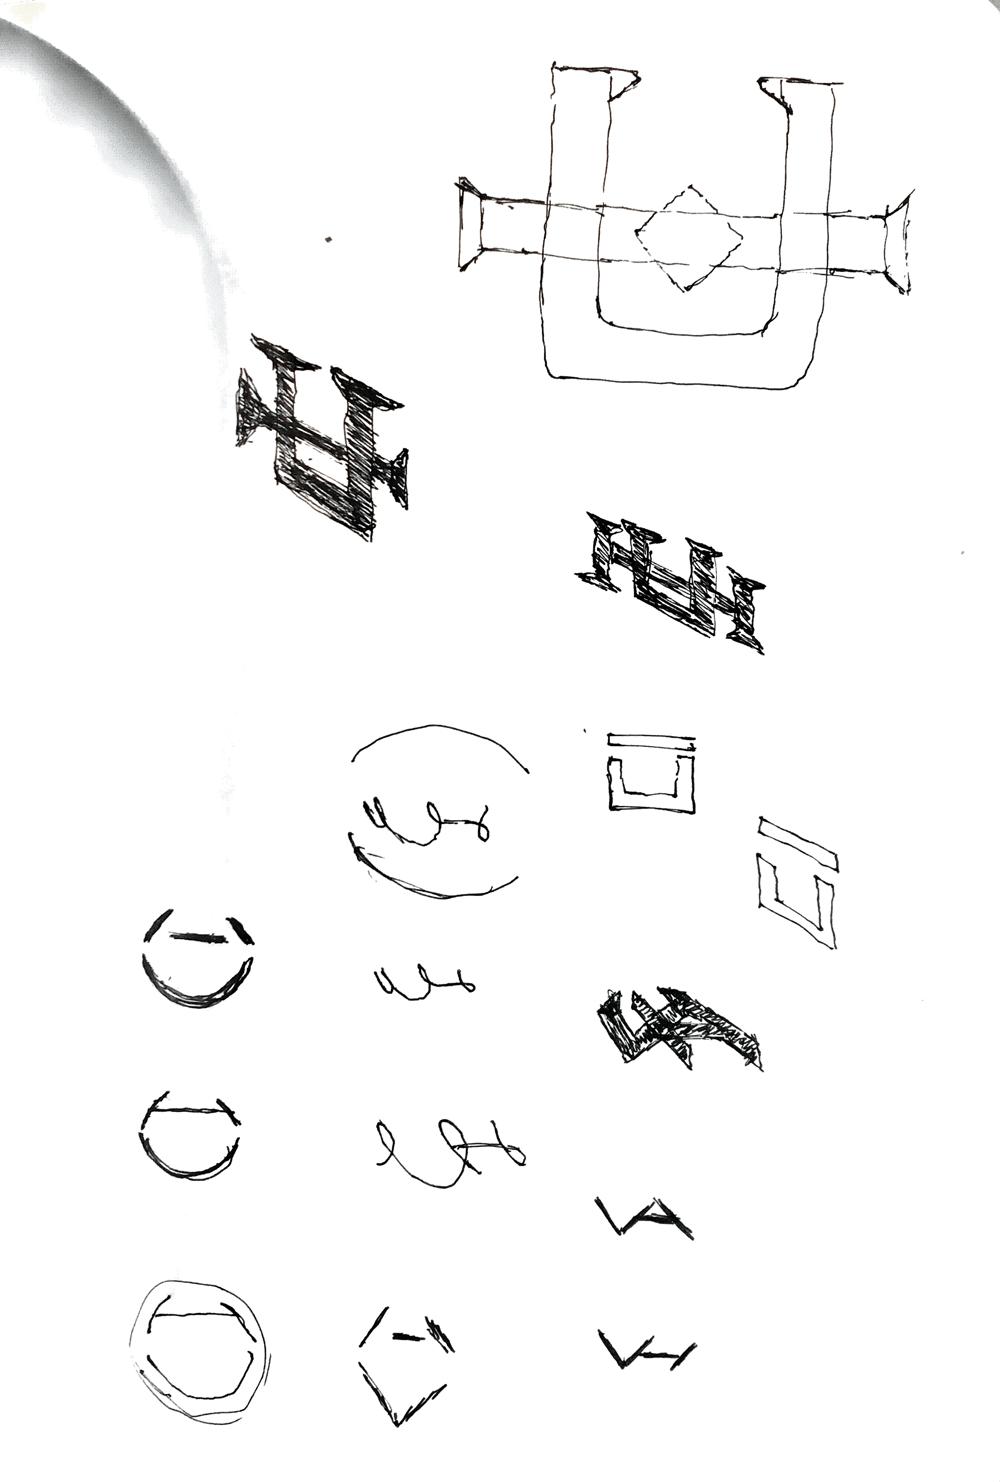 C.I. (CHUK IKÉH) Monogram - image 1 - student project